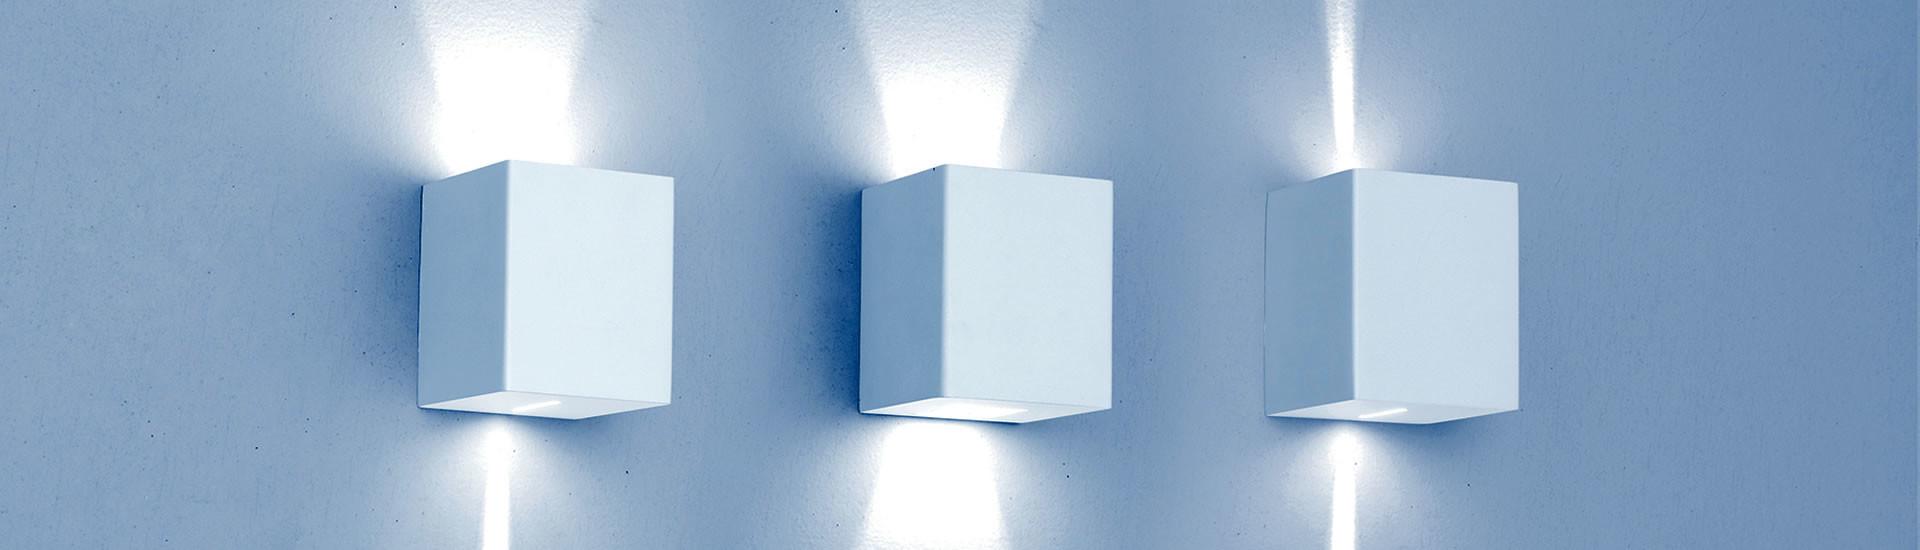 iluminacao-decorativa-slide01